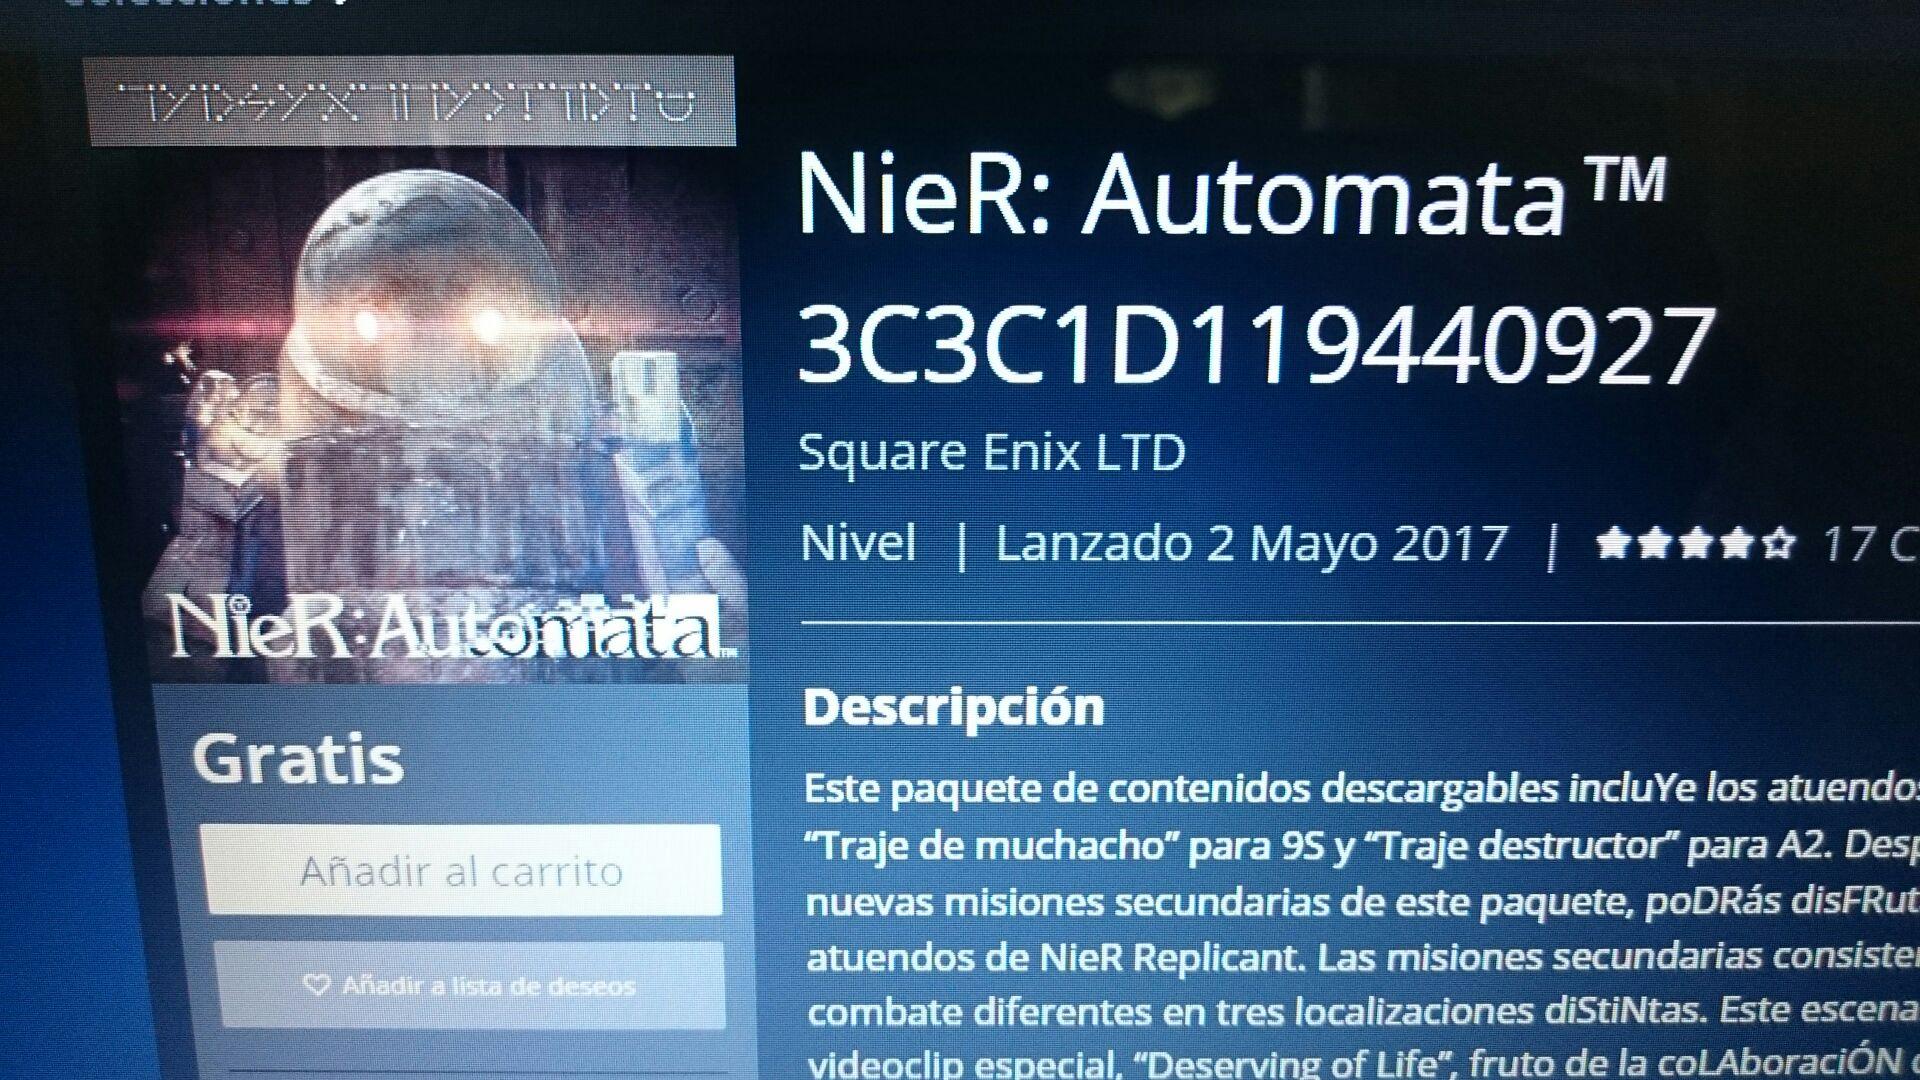 DLC Nier Autómata PS4 gratis